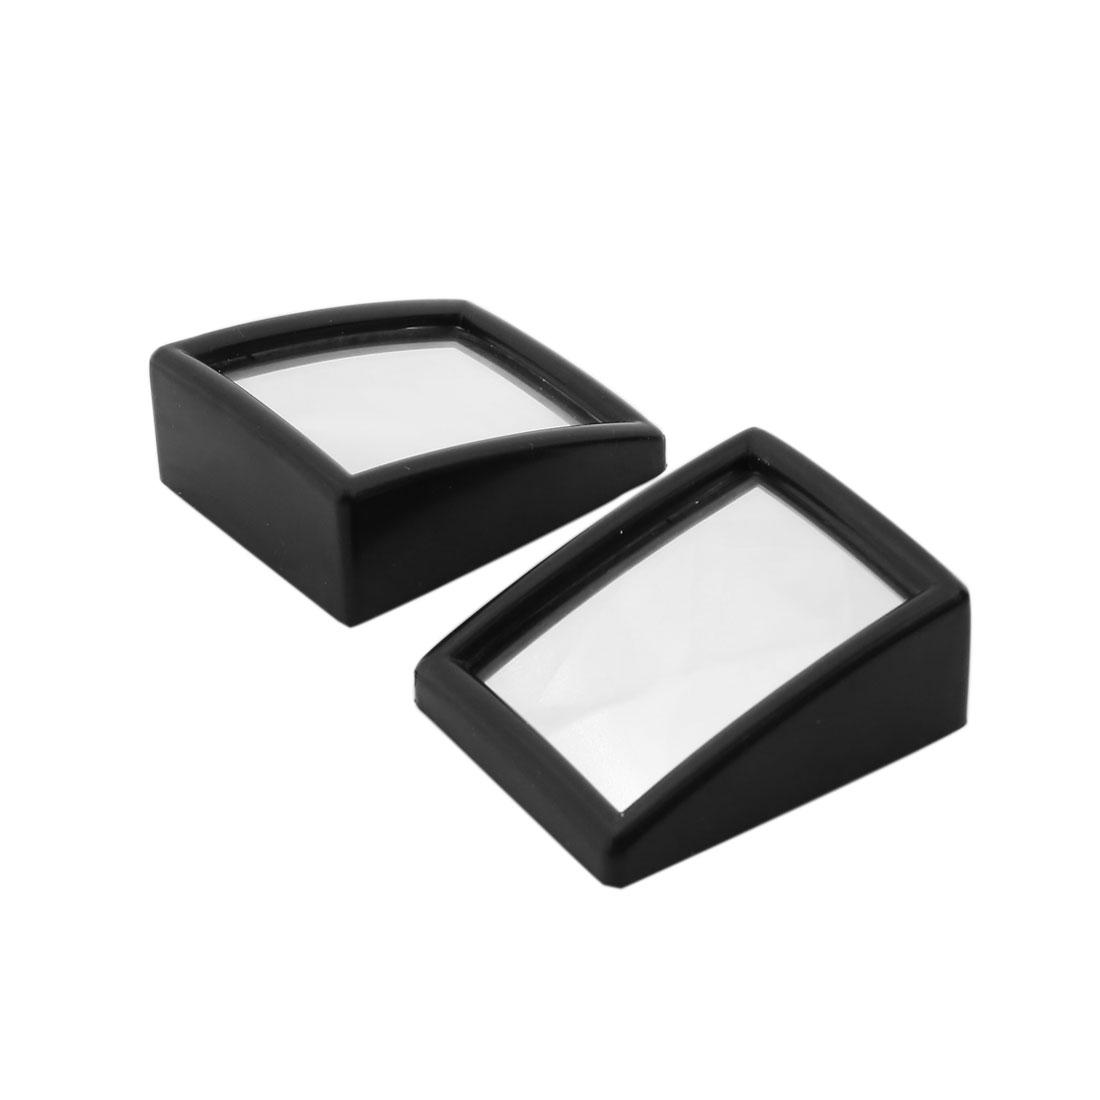 Pair Self-Adhesive Flat Car Rearview Side Mirror Black